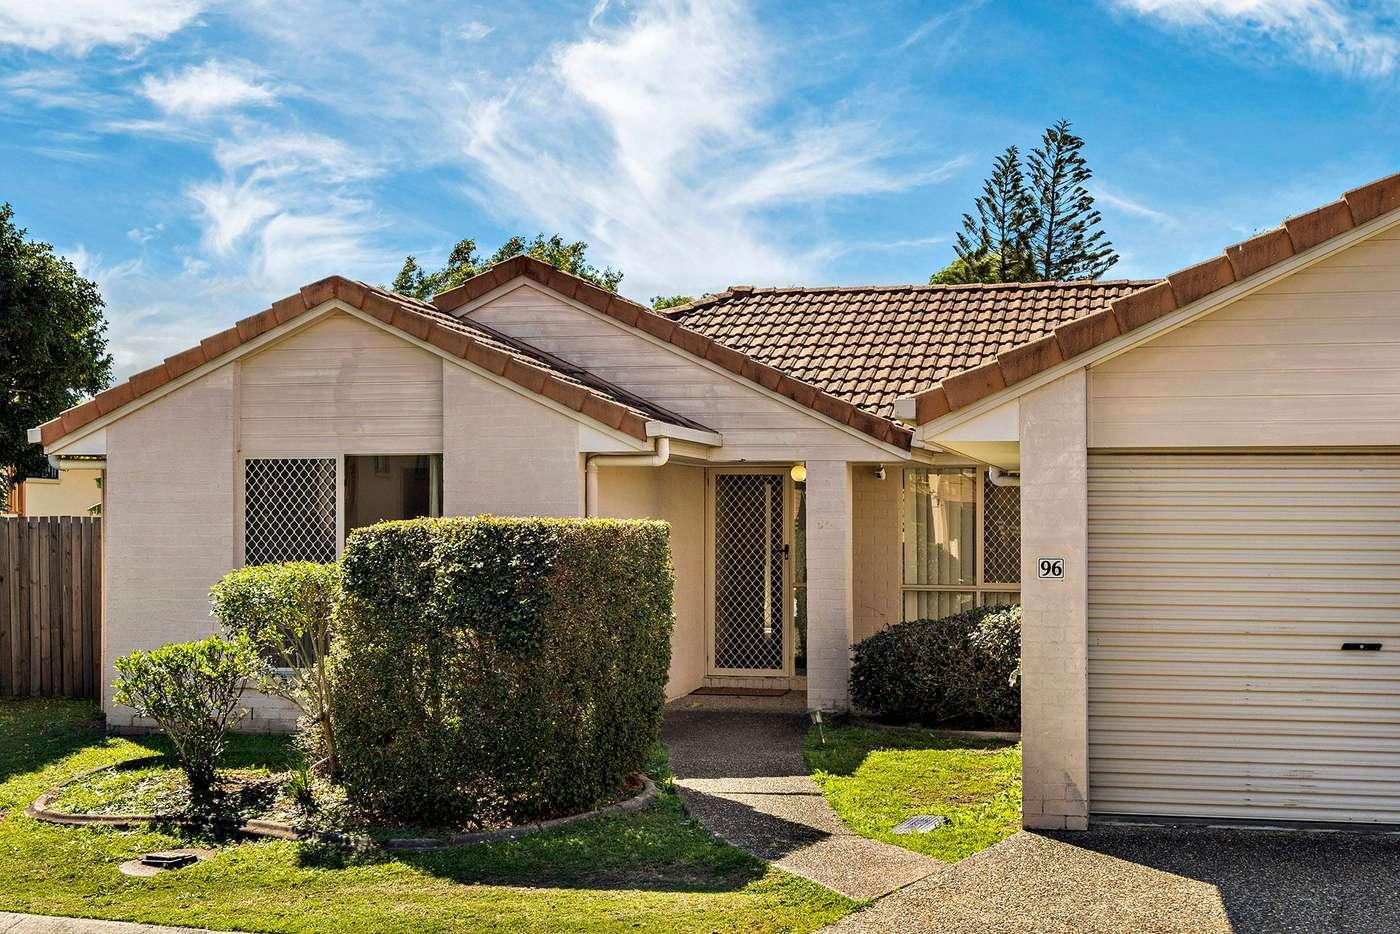 Main view of Homely villa listing, 96/134 Hill Road, Runcorn QLD 4113